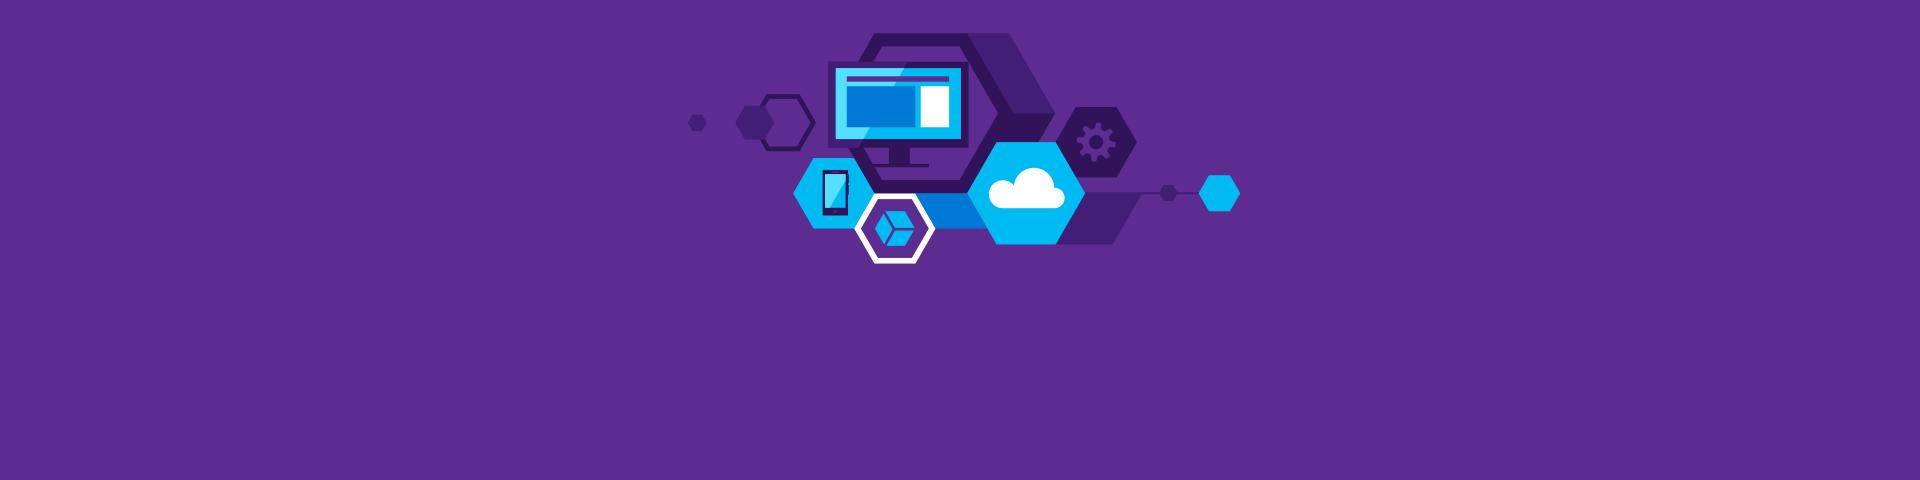 Компьютер, телефон, облако и другие значки с изображениями технологий